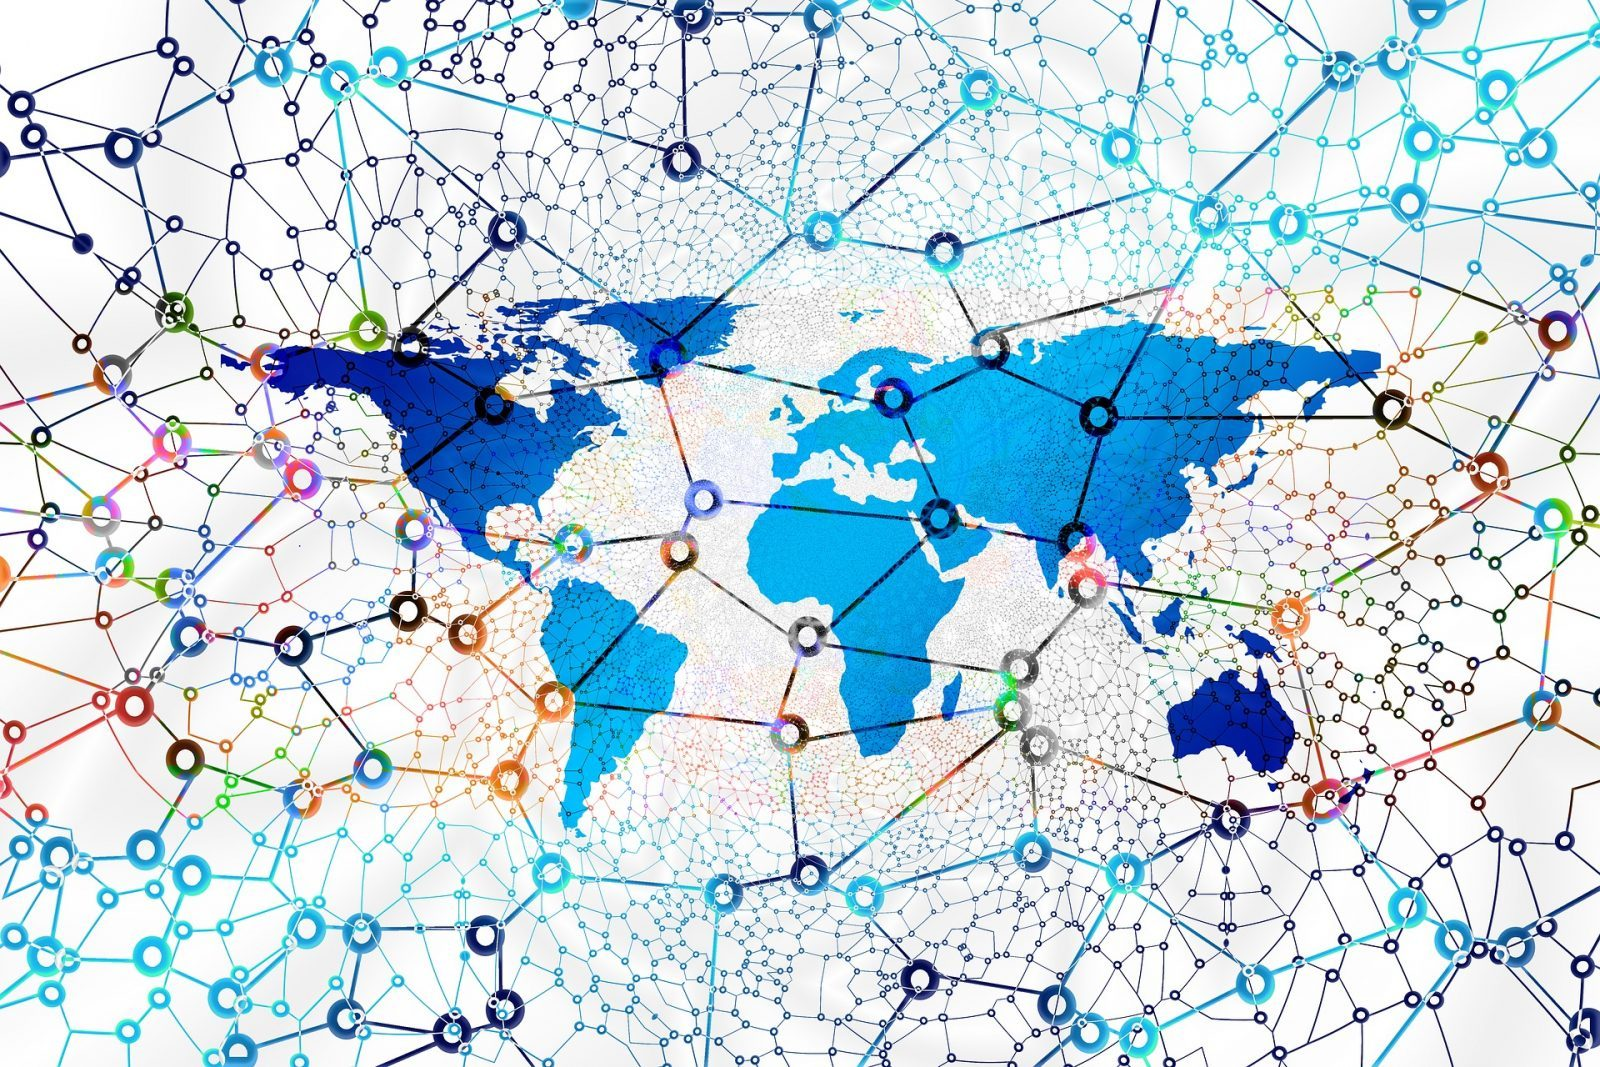 network-3139201_1920